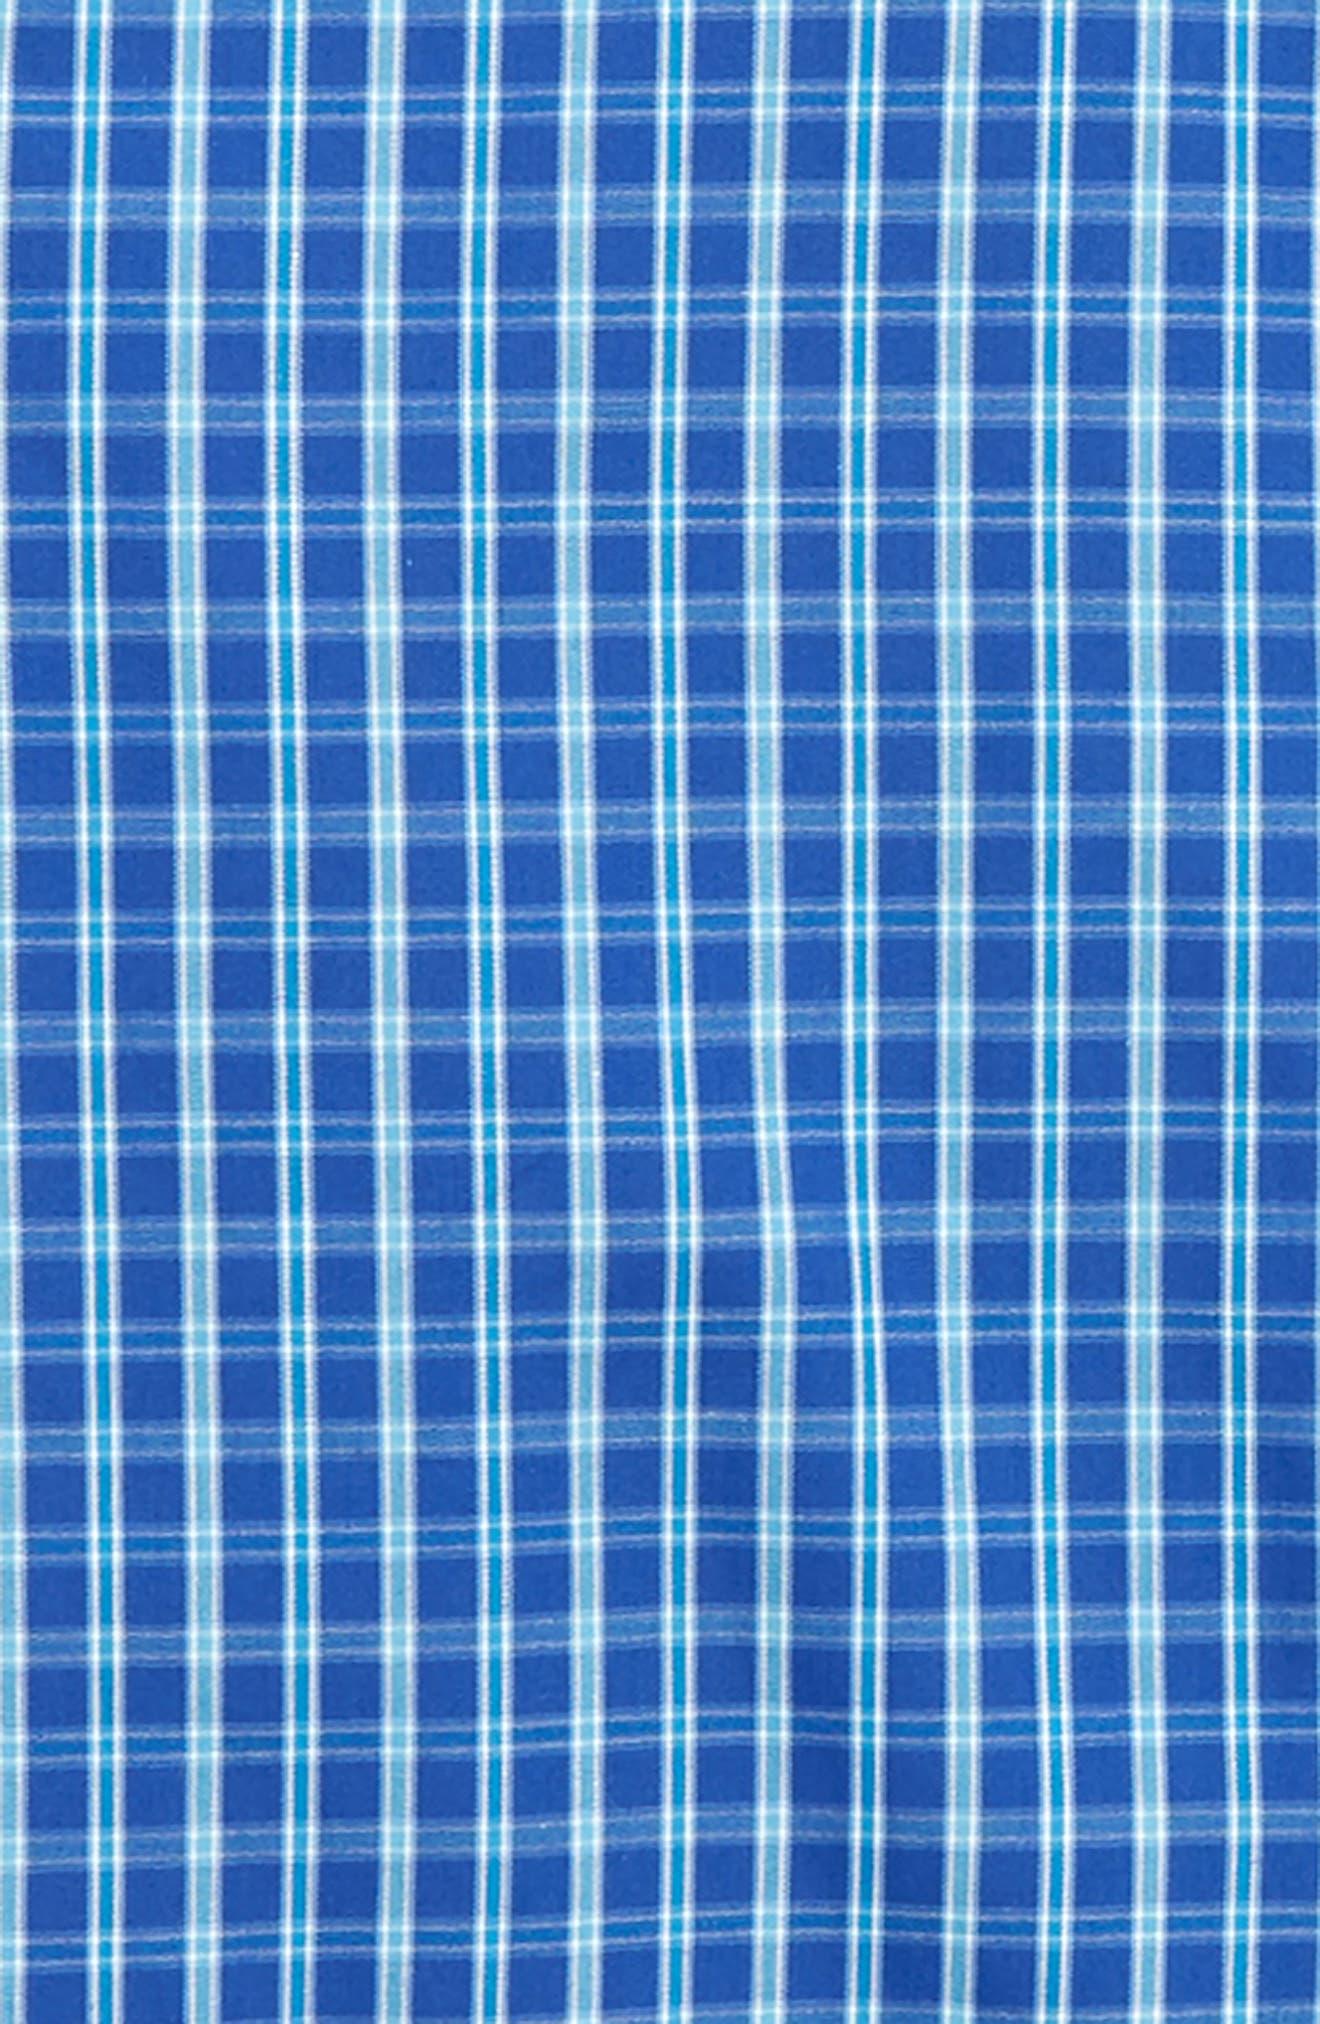 Plaid Dress Shirt,                             Alternate thumbnail 2, color,                             420